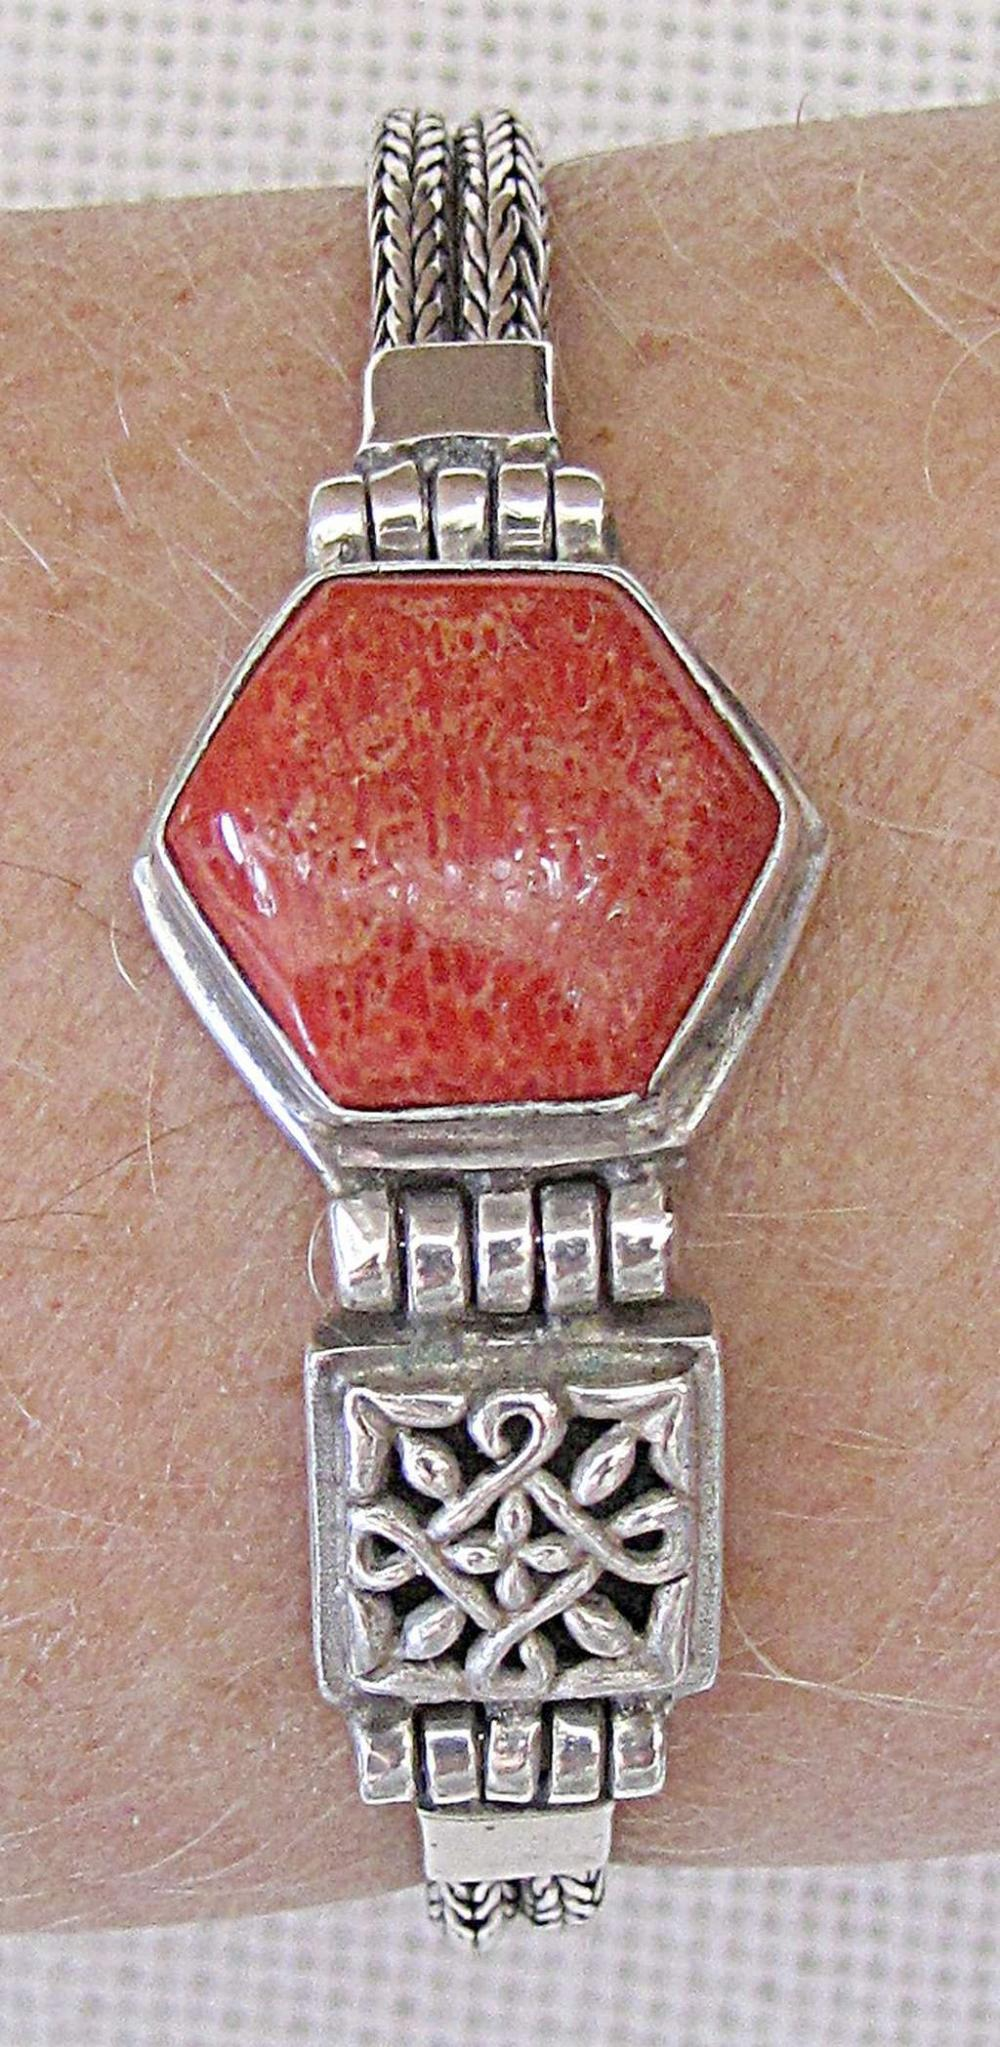 ART DECO SILVER STERLING BRACELET SET WITH RED CORAL, 21 GR.